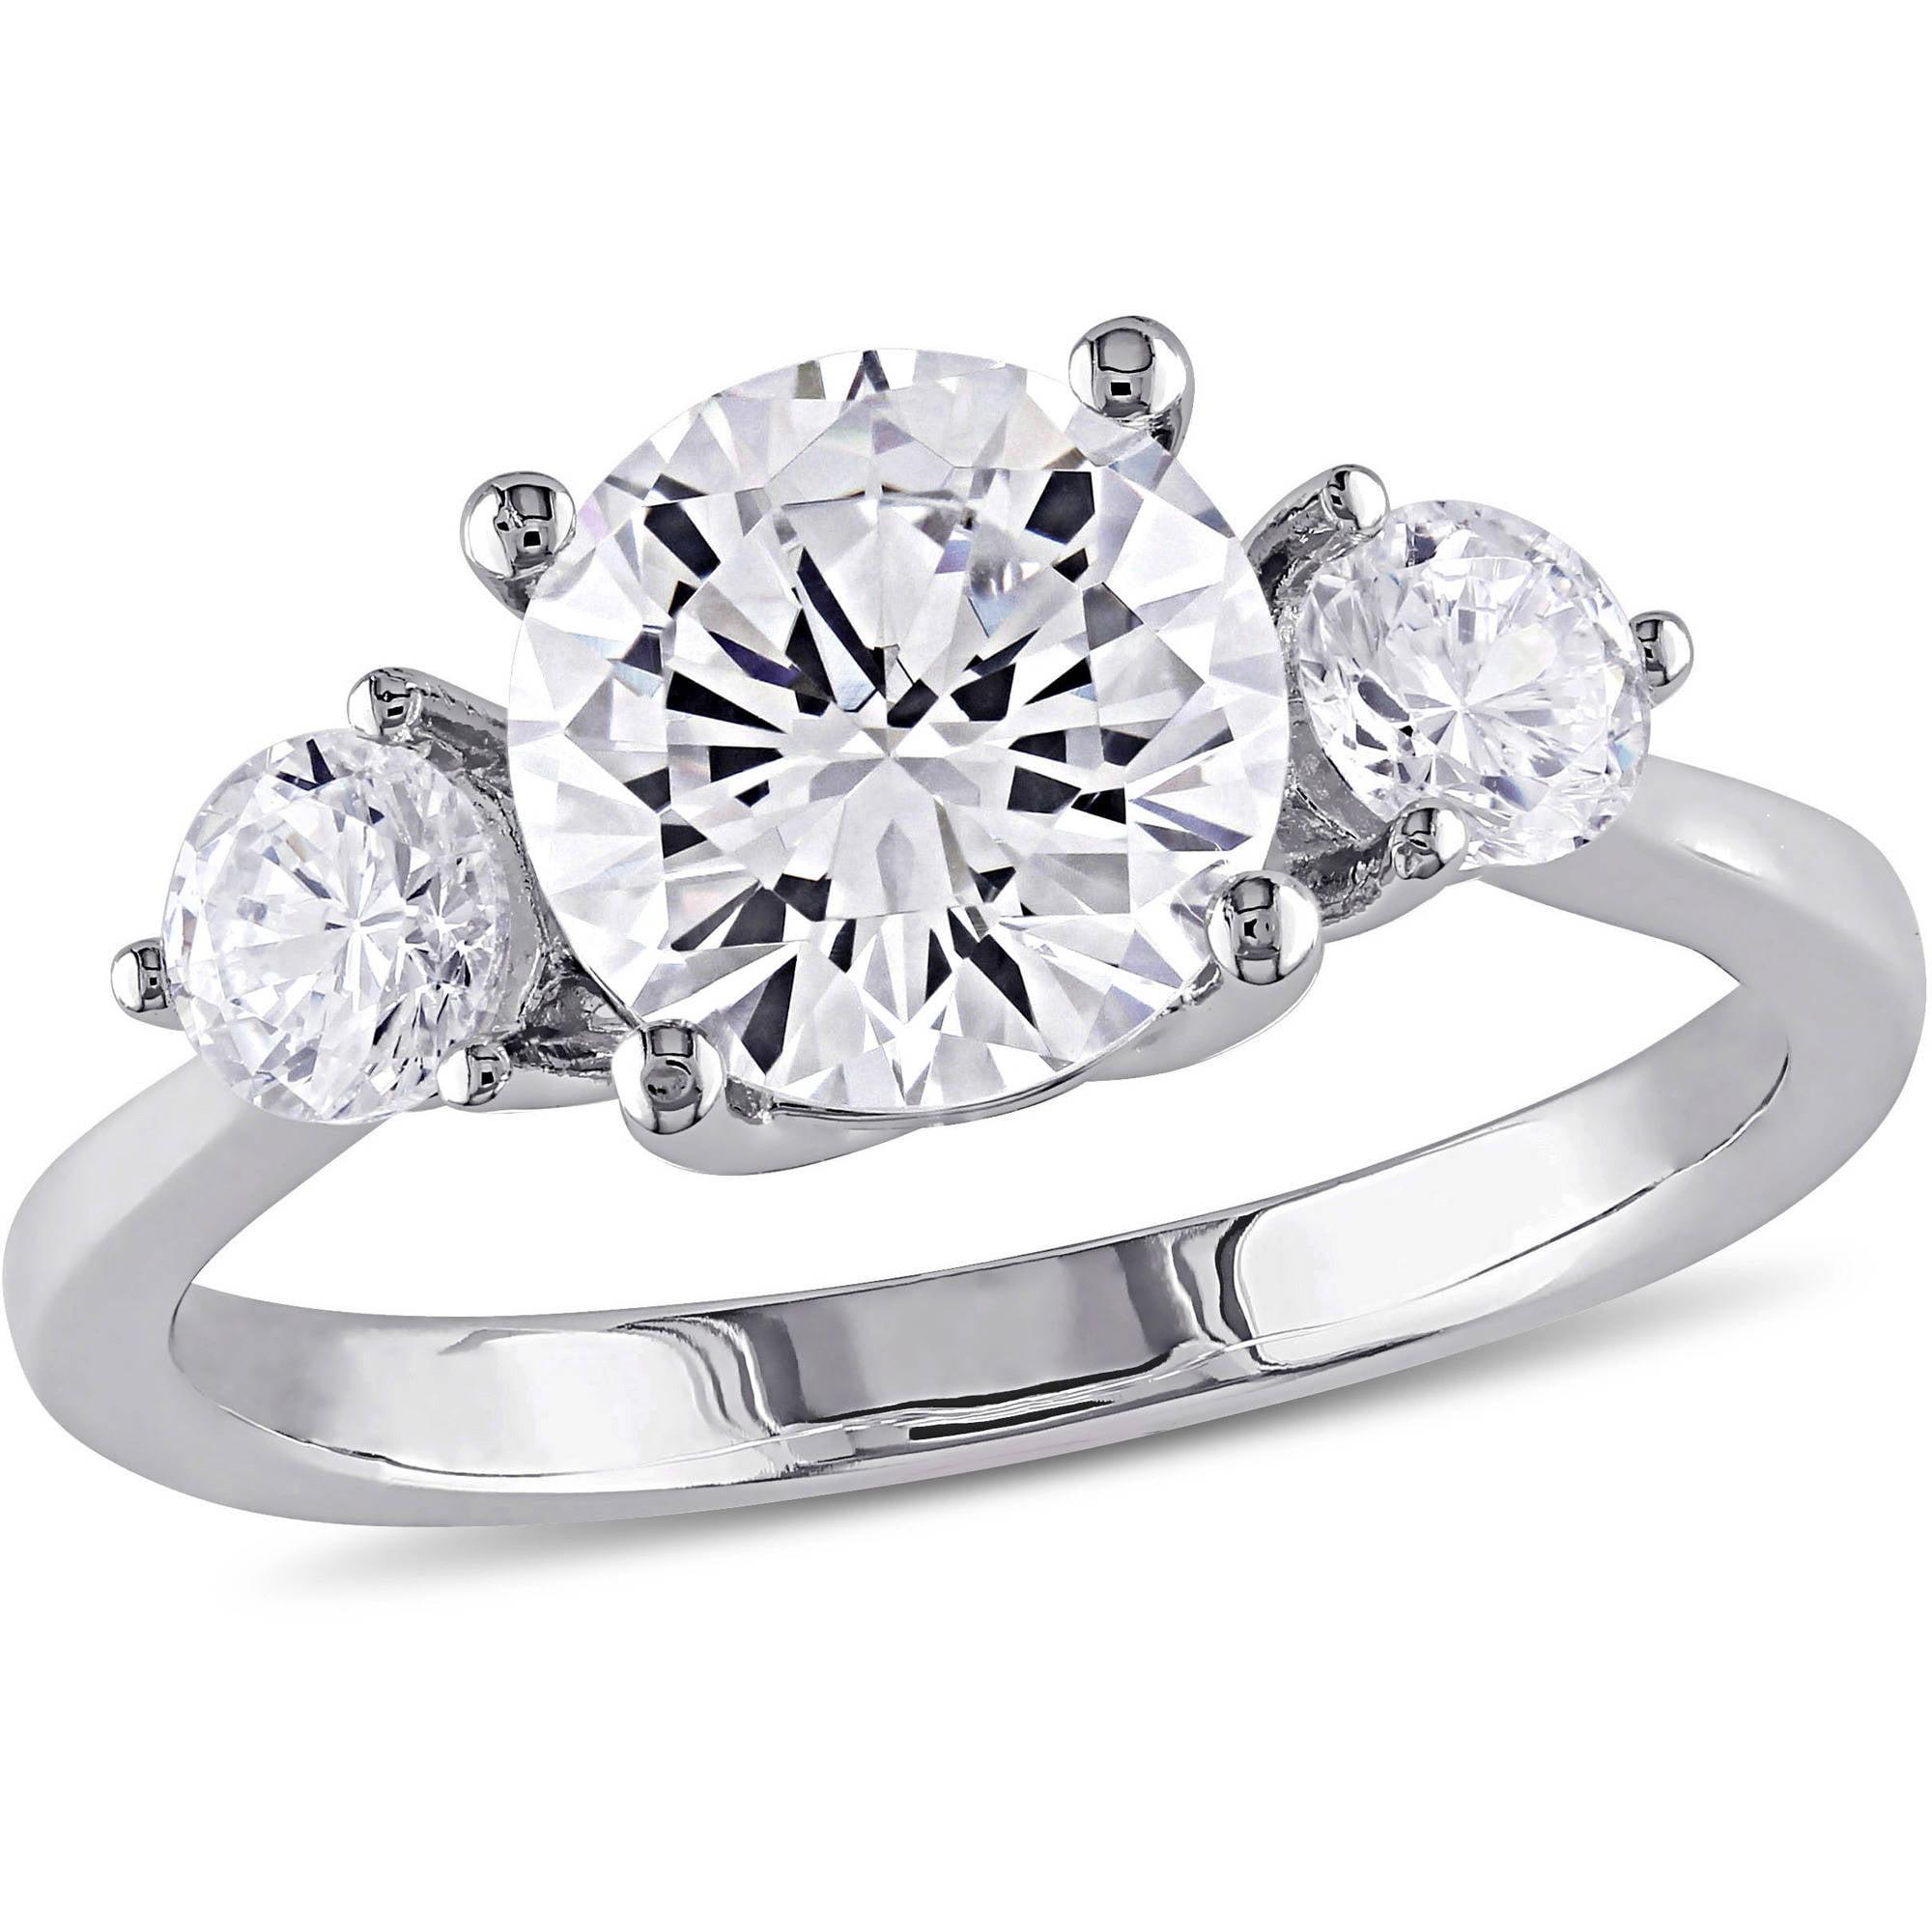 Miabella 4-1/3 Carat T.G.W. CZ Sterling Silver Three-Stone Engagement Ring